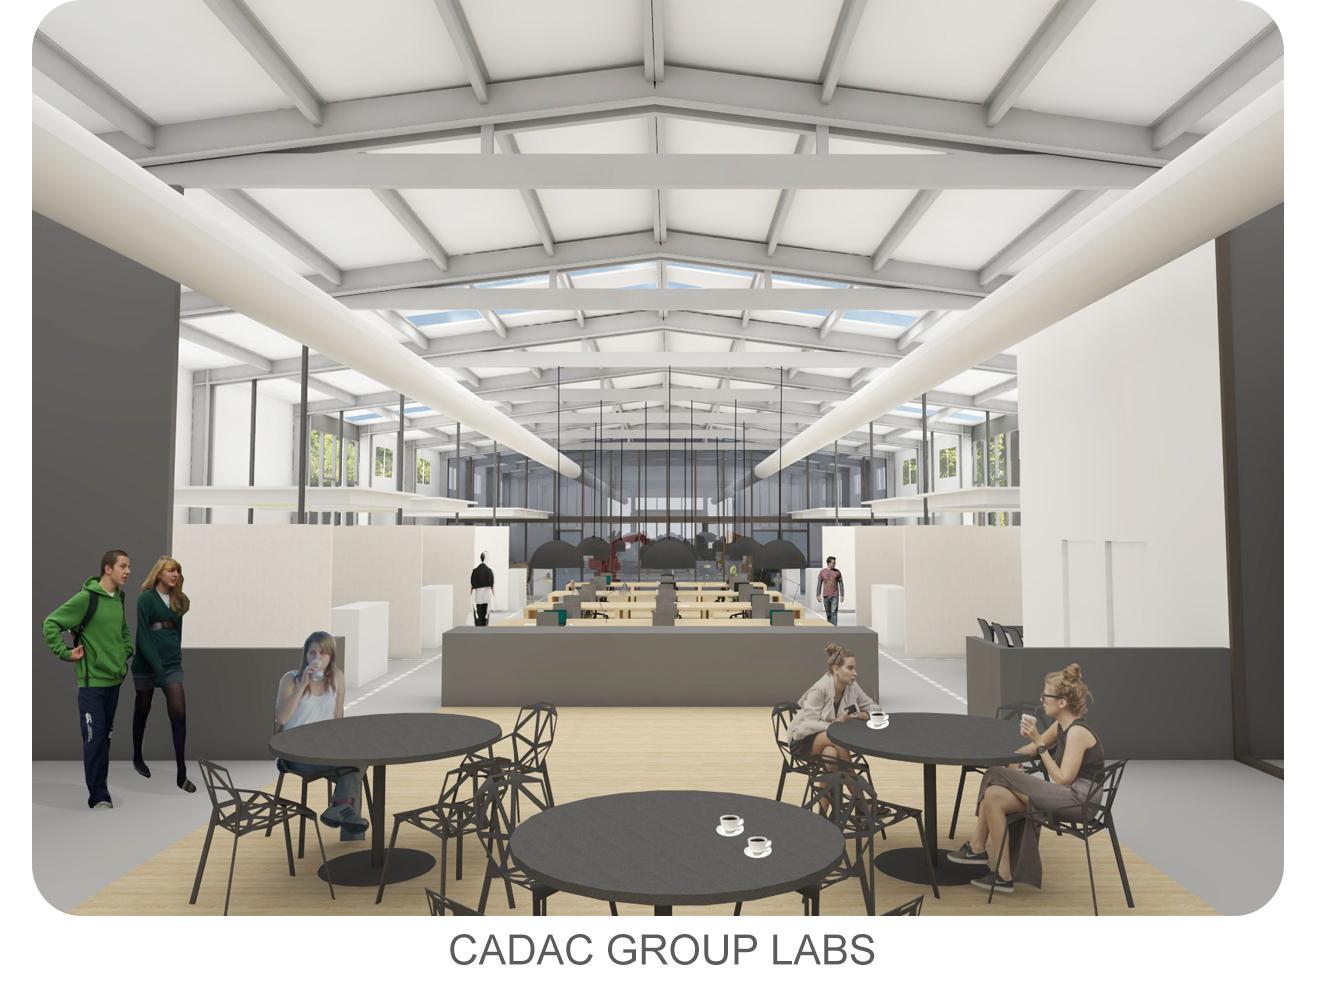 Cadac Group labs